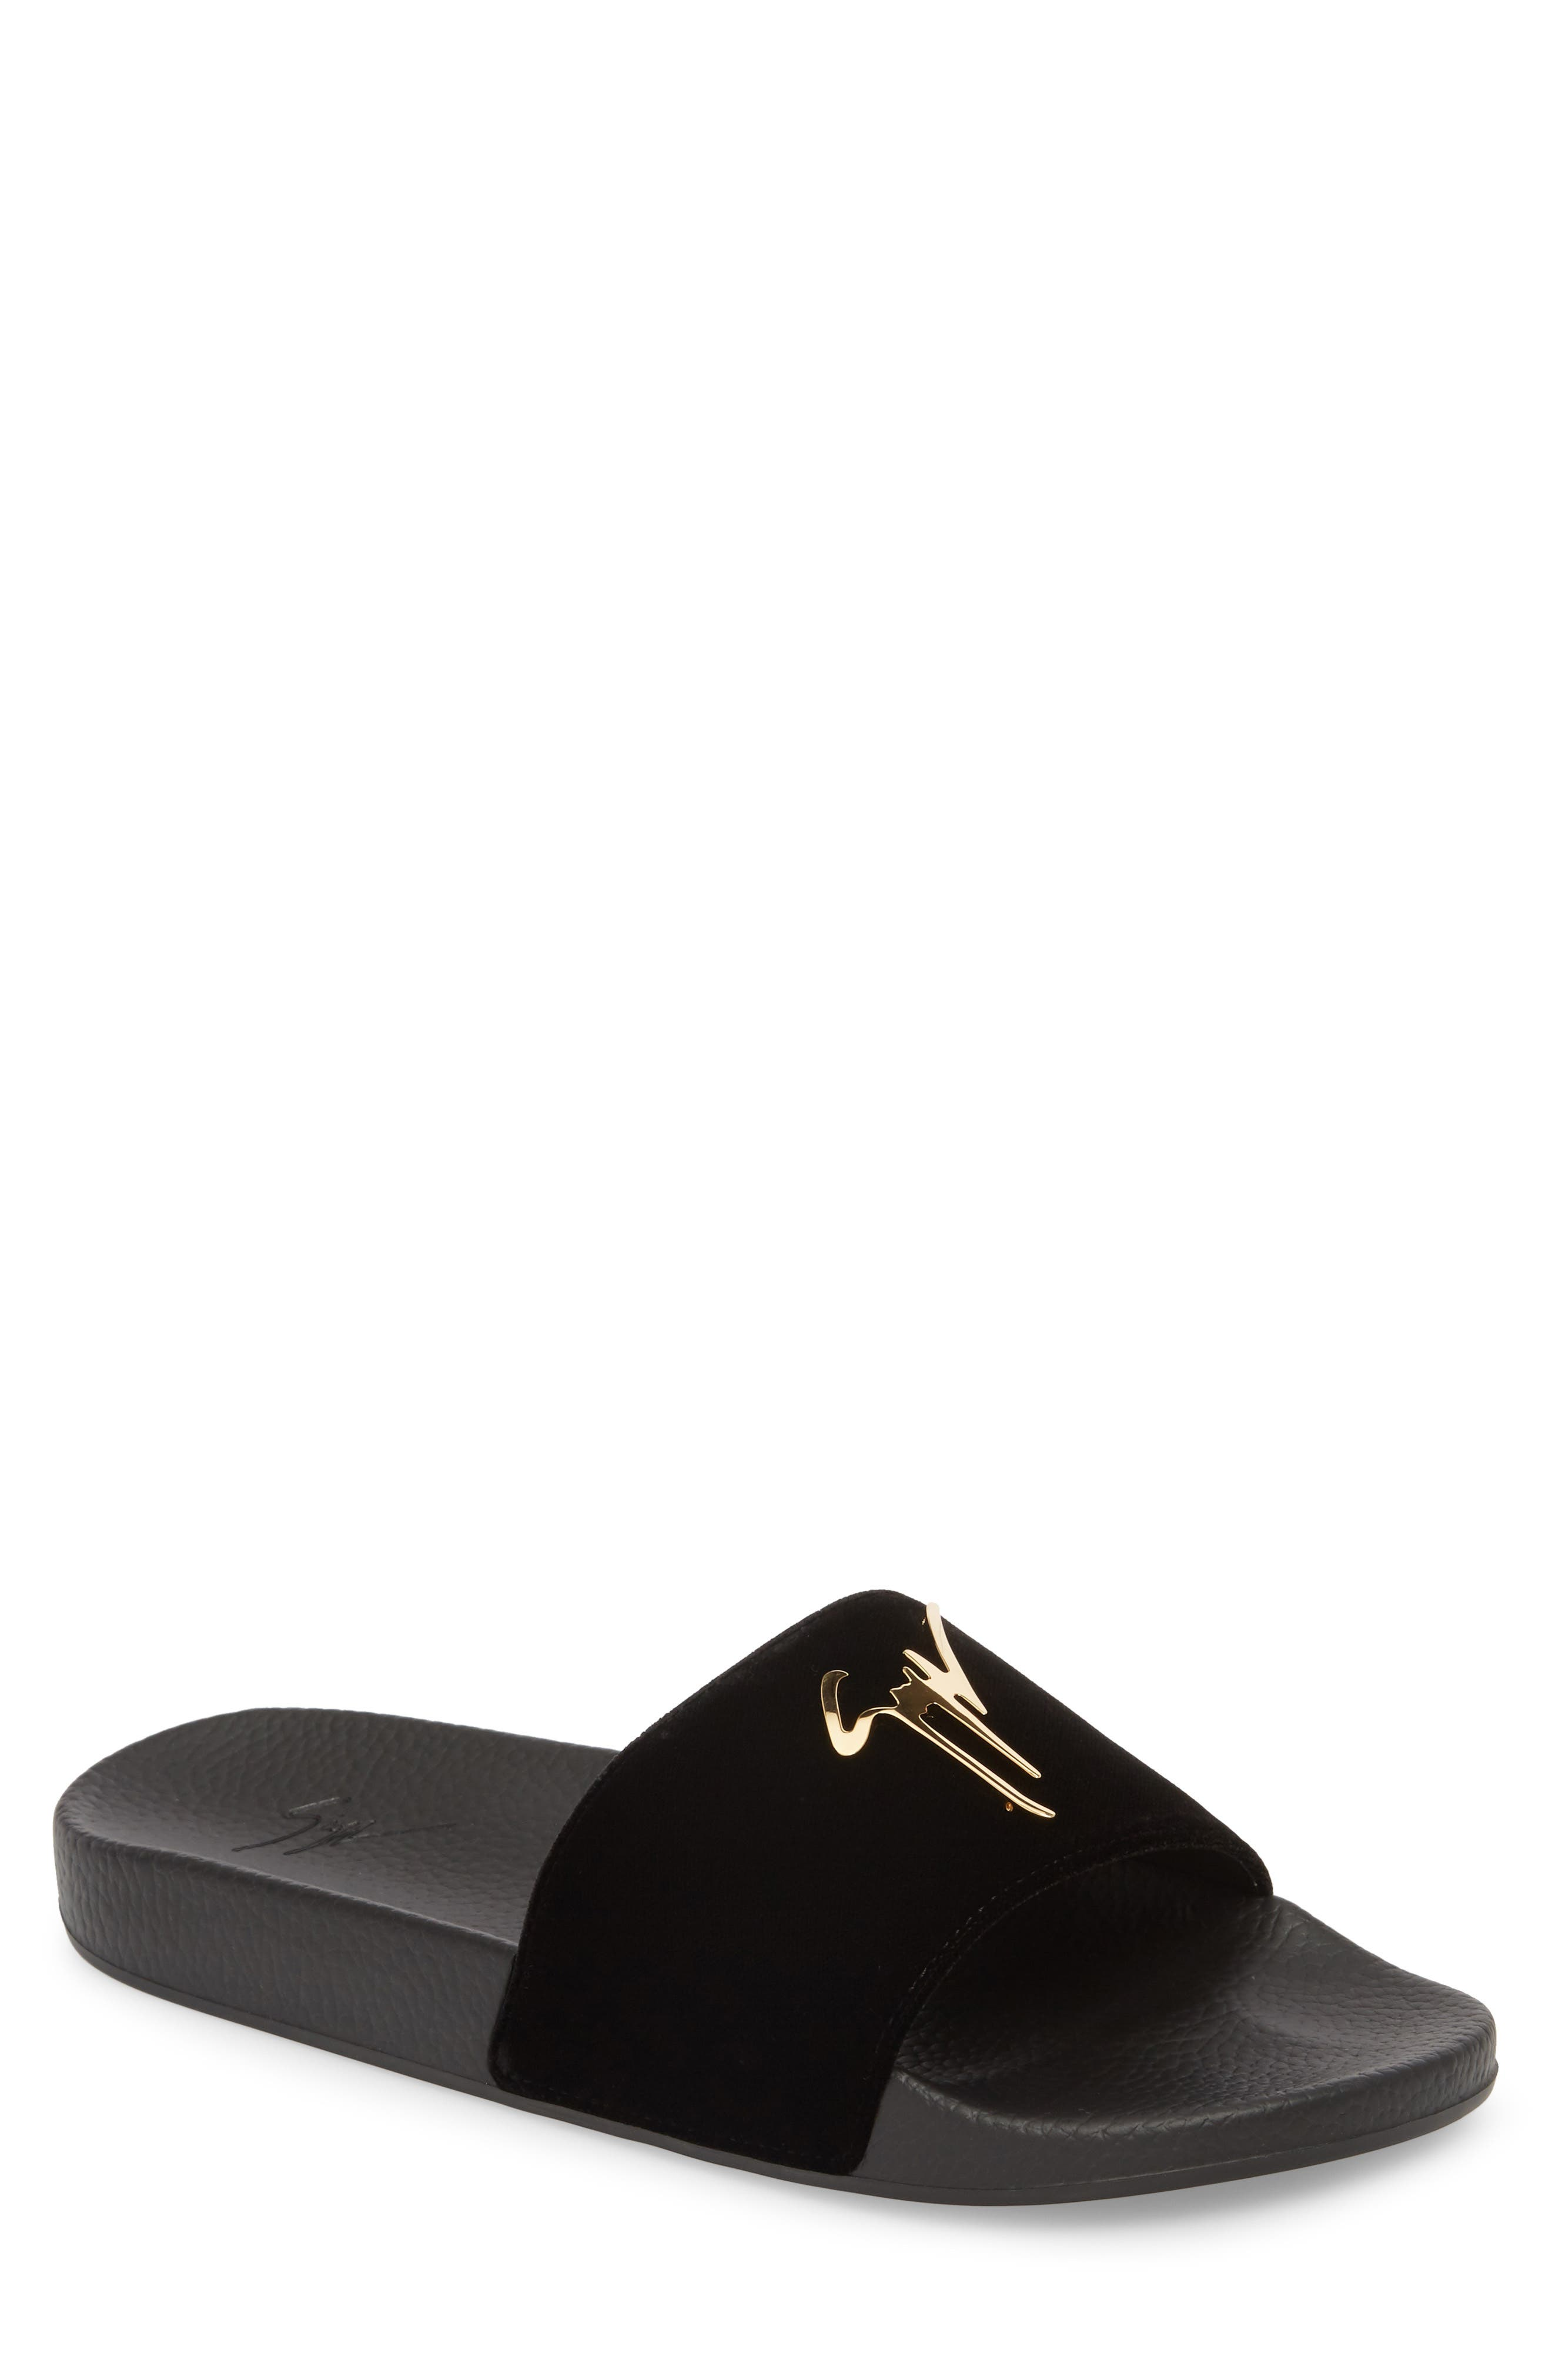 GIUSEPPE ZANOTTI Slide Sandal, Main, color, NERO